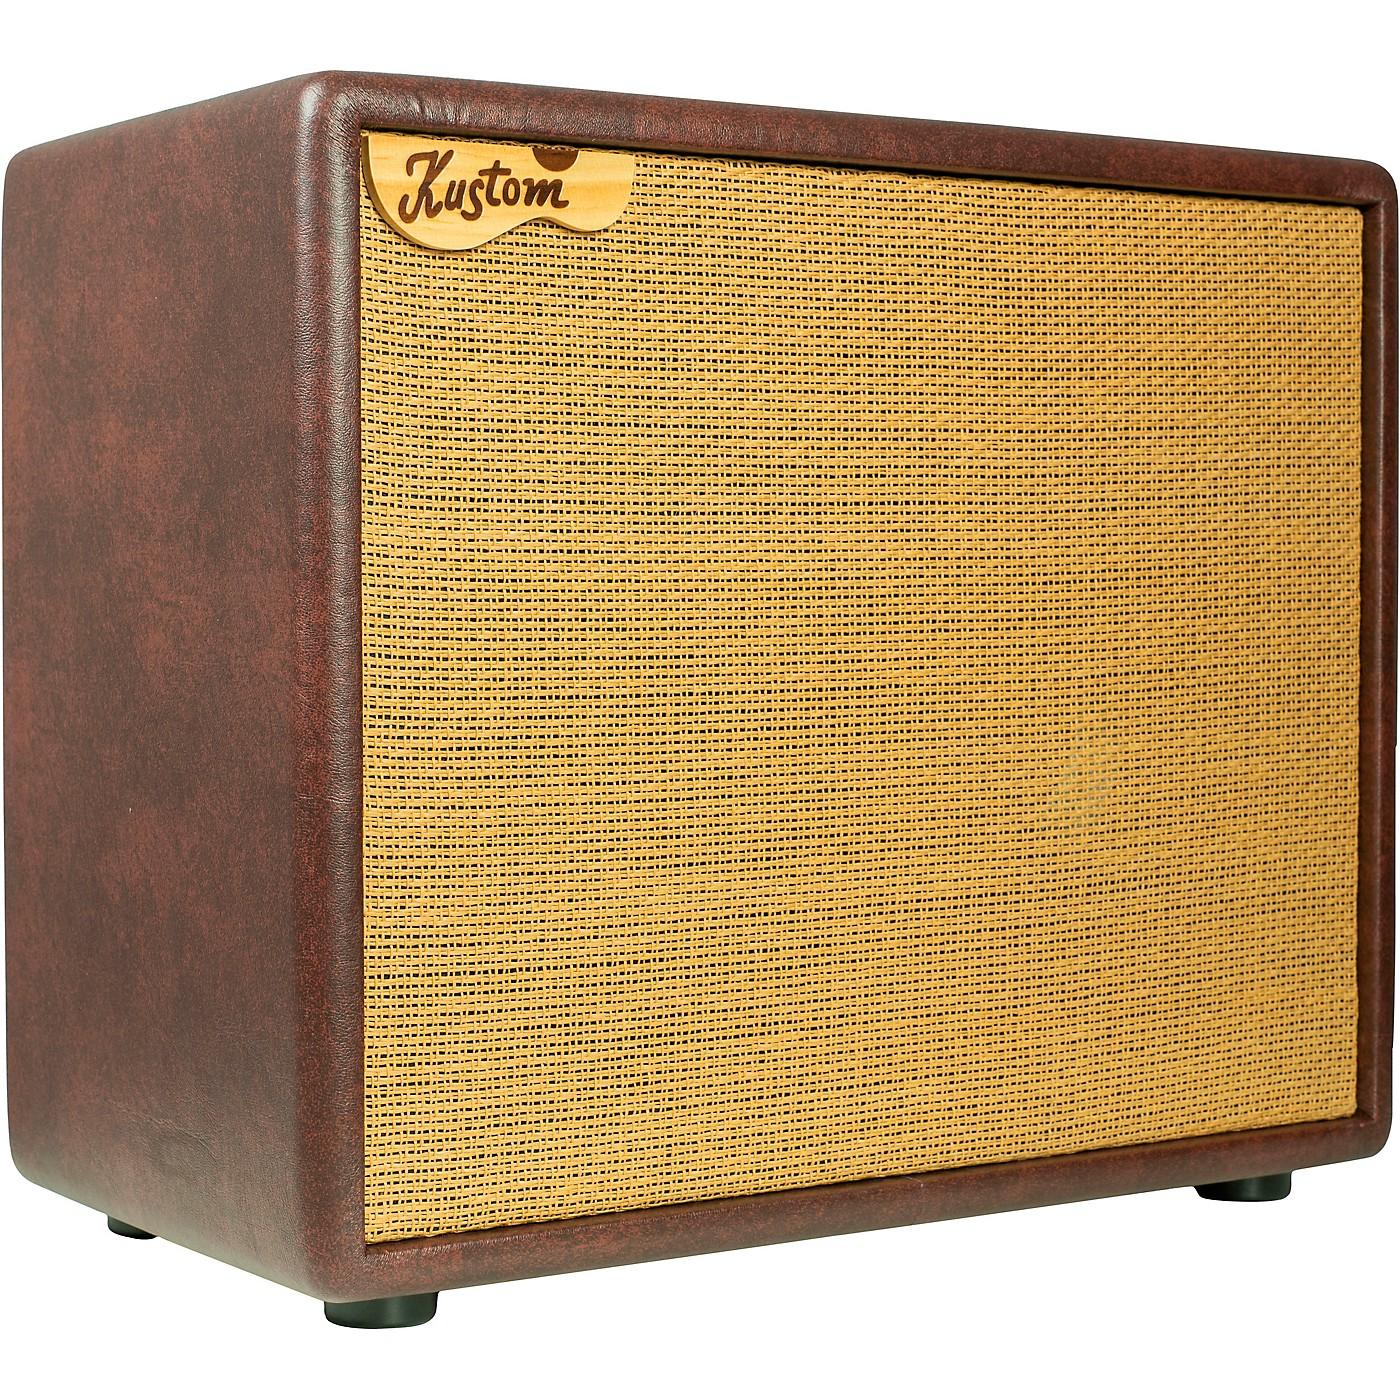 Kustom Sienna Pro 35 30W 1x10 Acoustic Combo Amplifier thumbnail